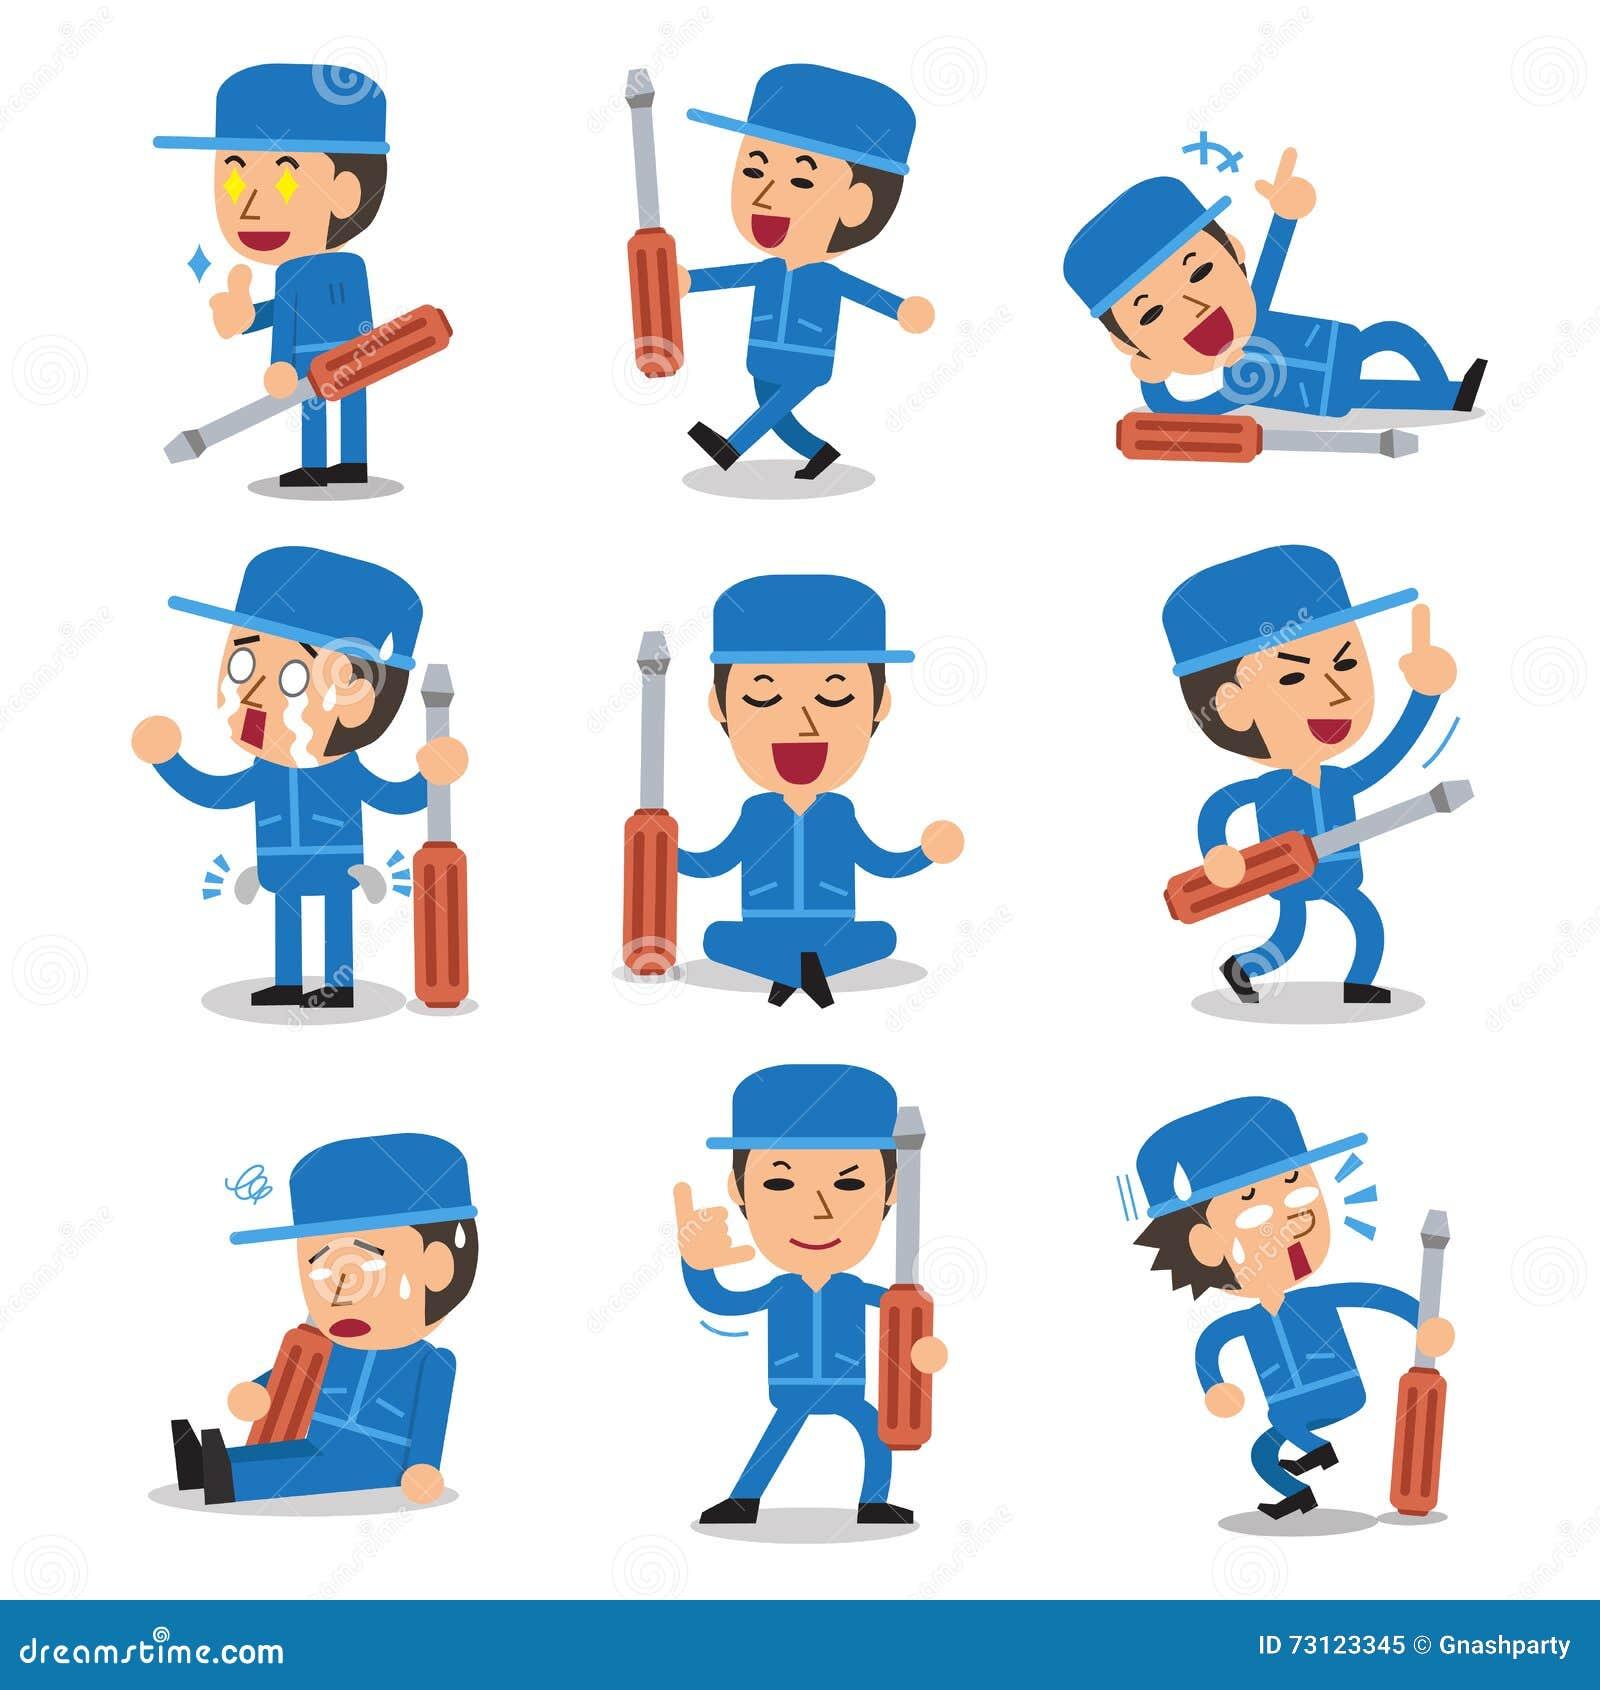 Character Design Set : Cartoon technician character pose set stock vector